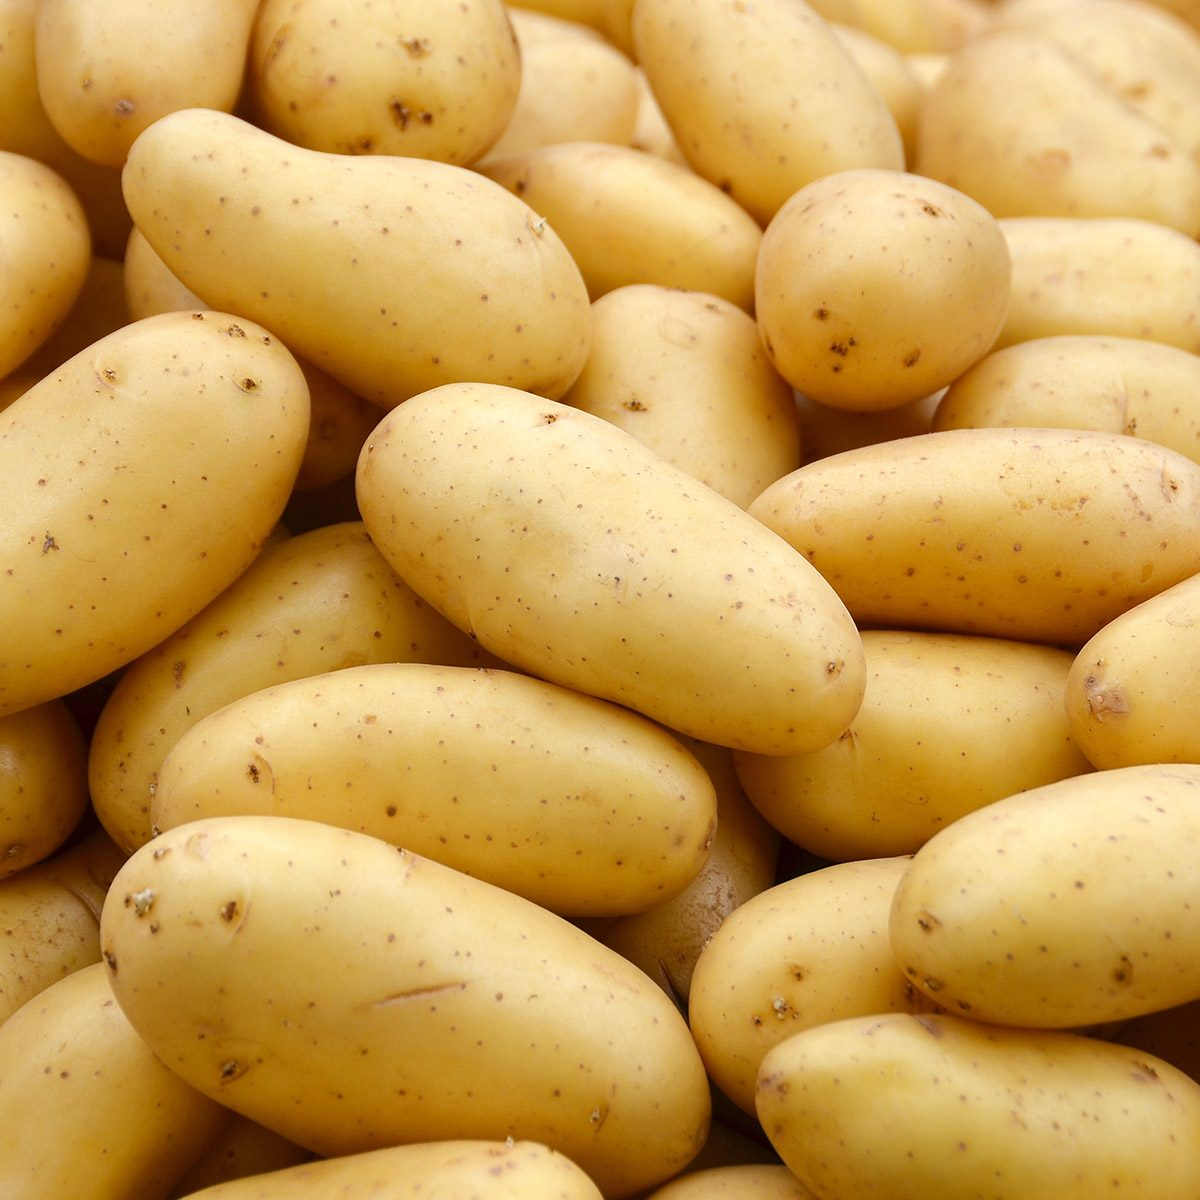 Potatoes background. ; Shutterstock ID 346577078; Job (TFH, TOH, RD, BNB, CWM, CM): Taste of Home